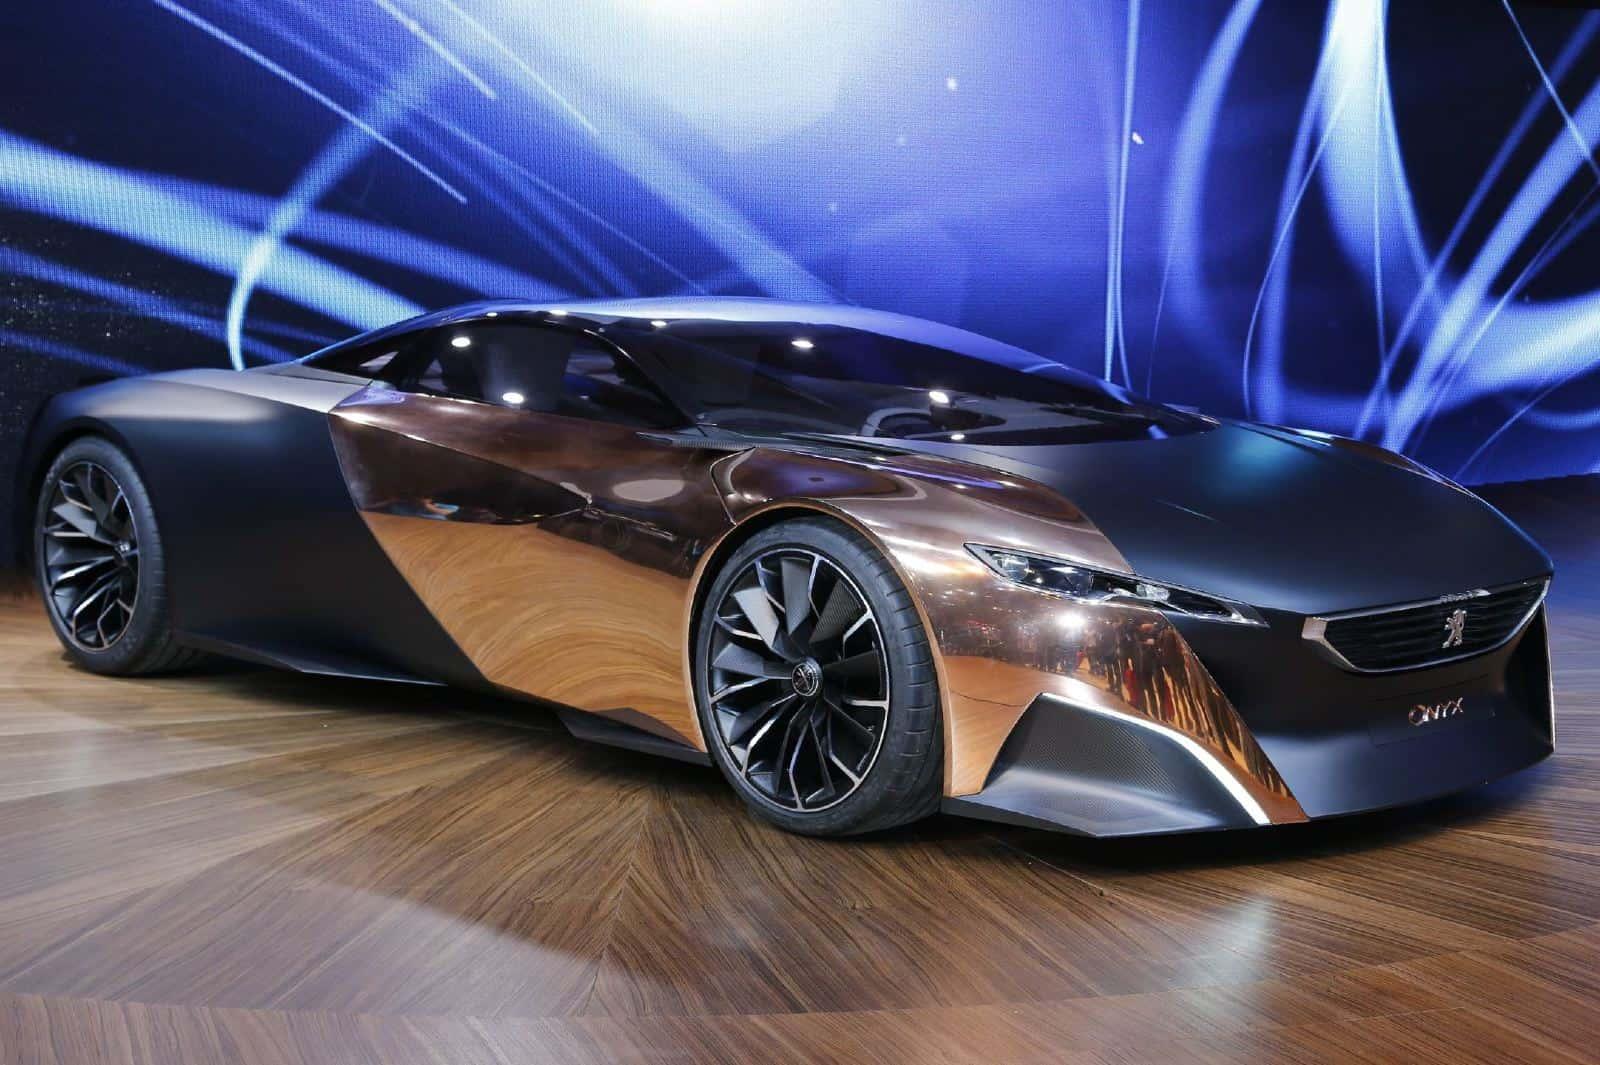 Meet The Designers: Peugeot Onyx Concept